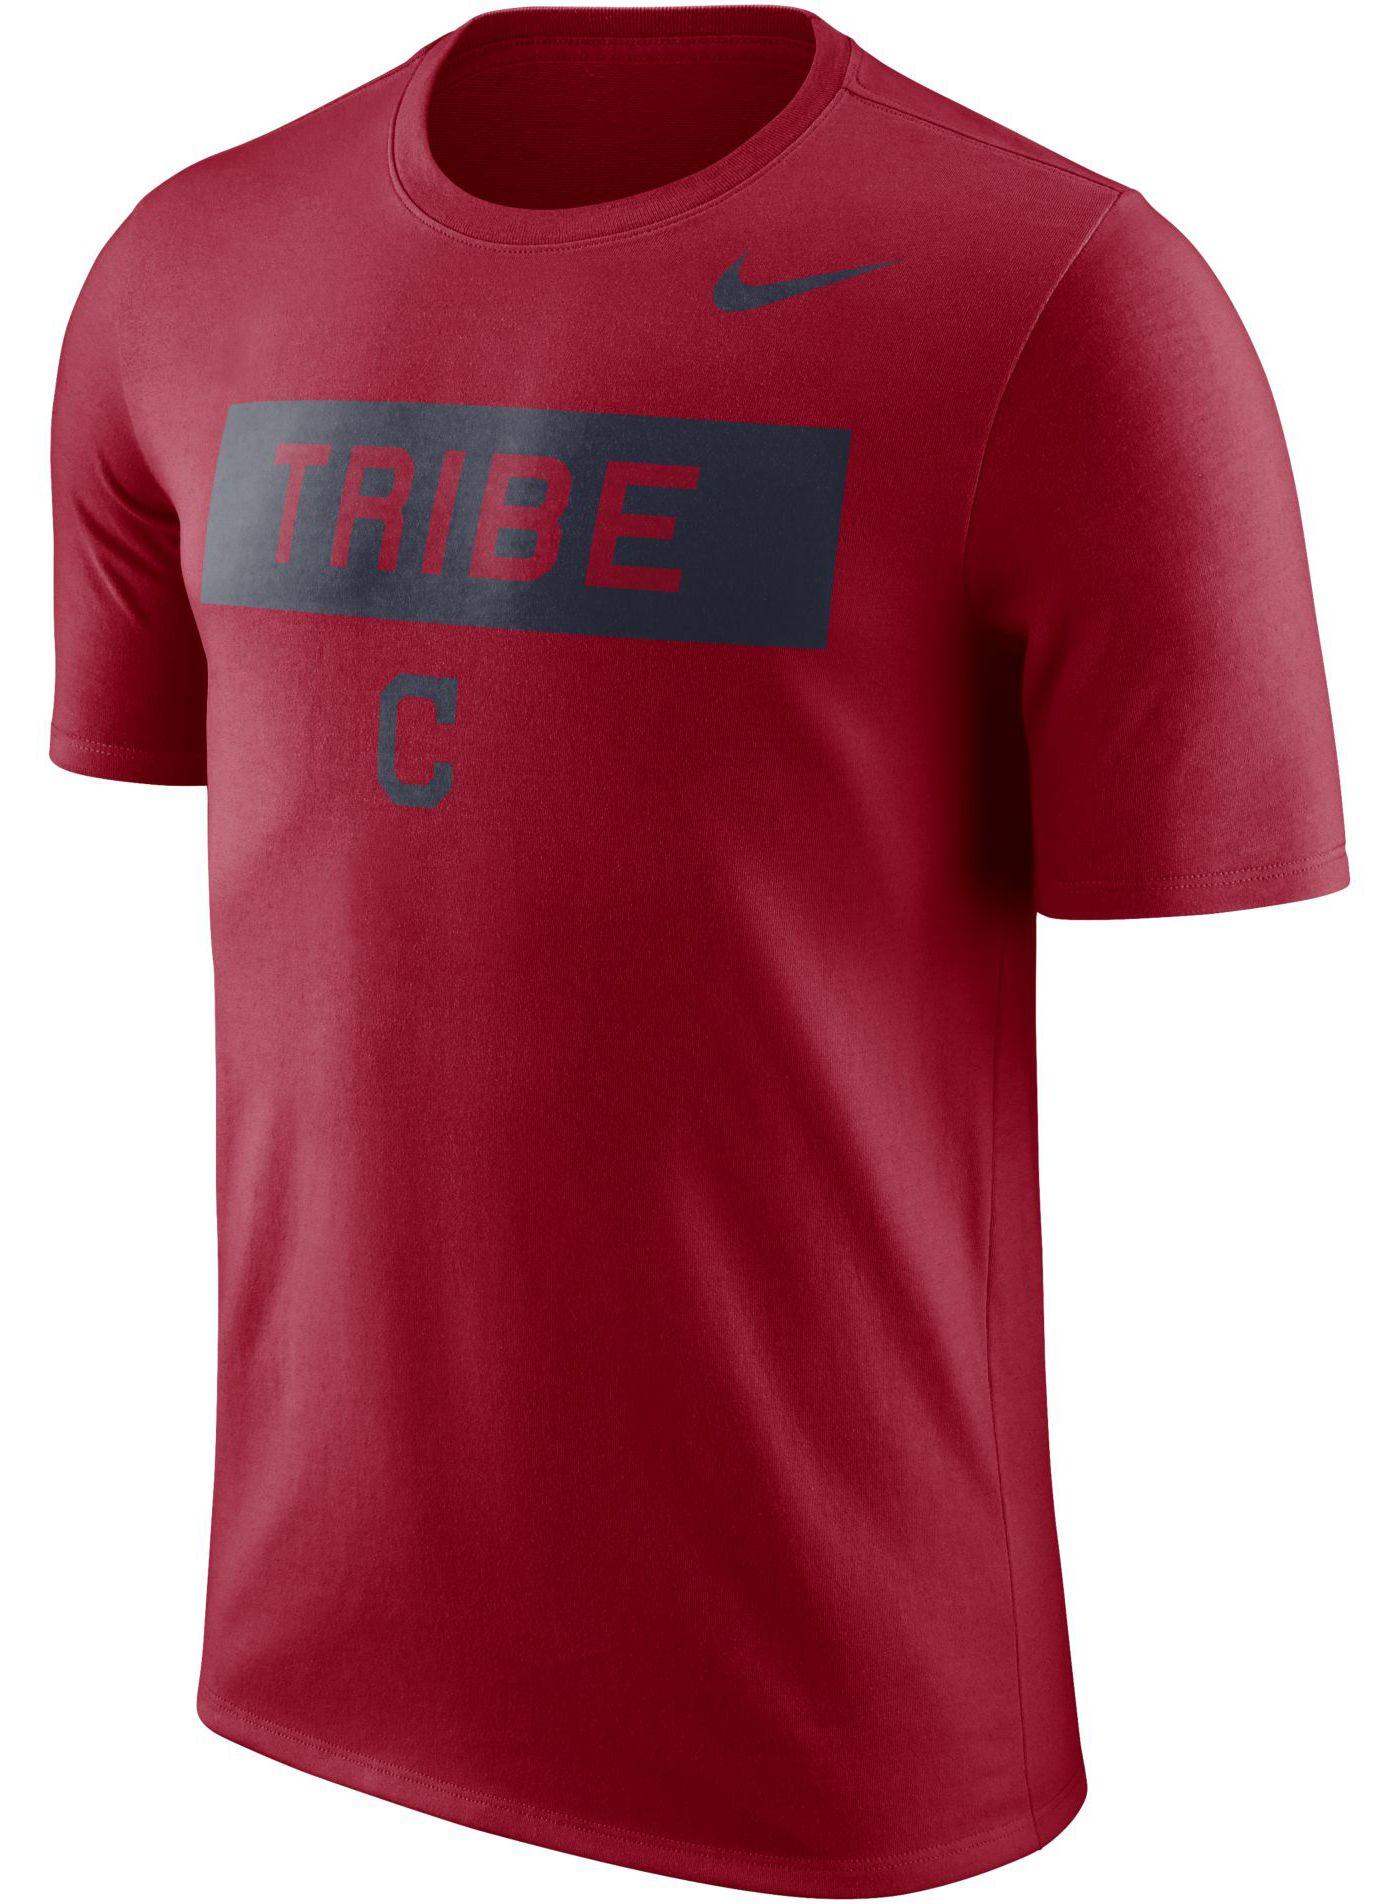 "Nike Men's Cleveland Indians Dri-FIT ""Tribe"" T-Shirt"